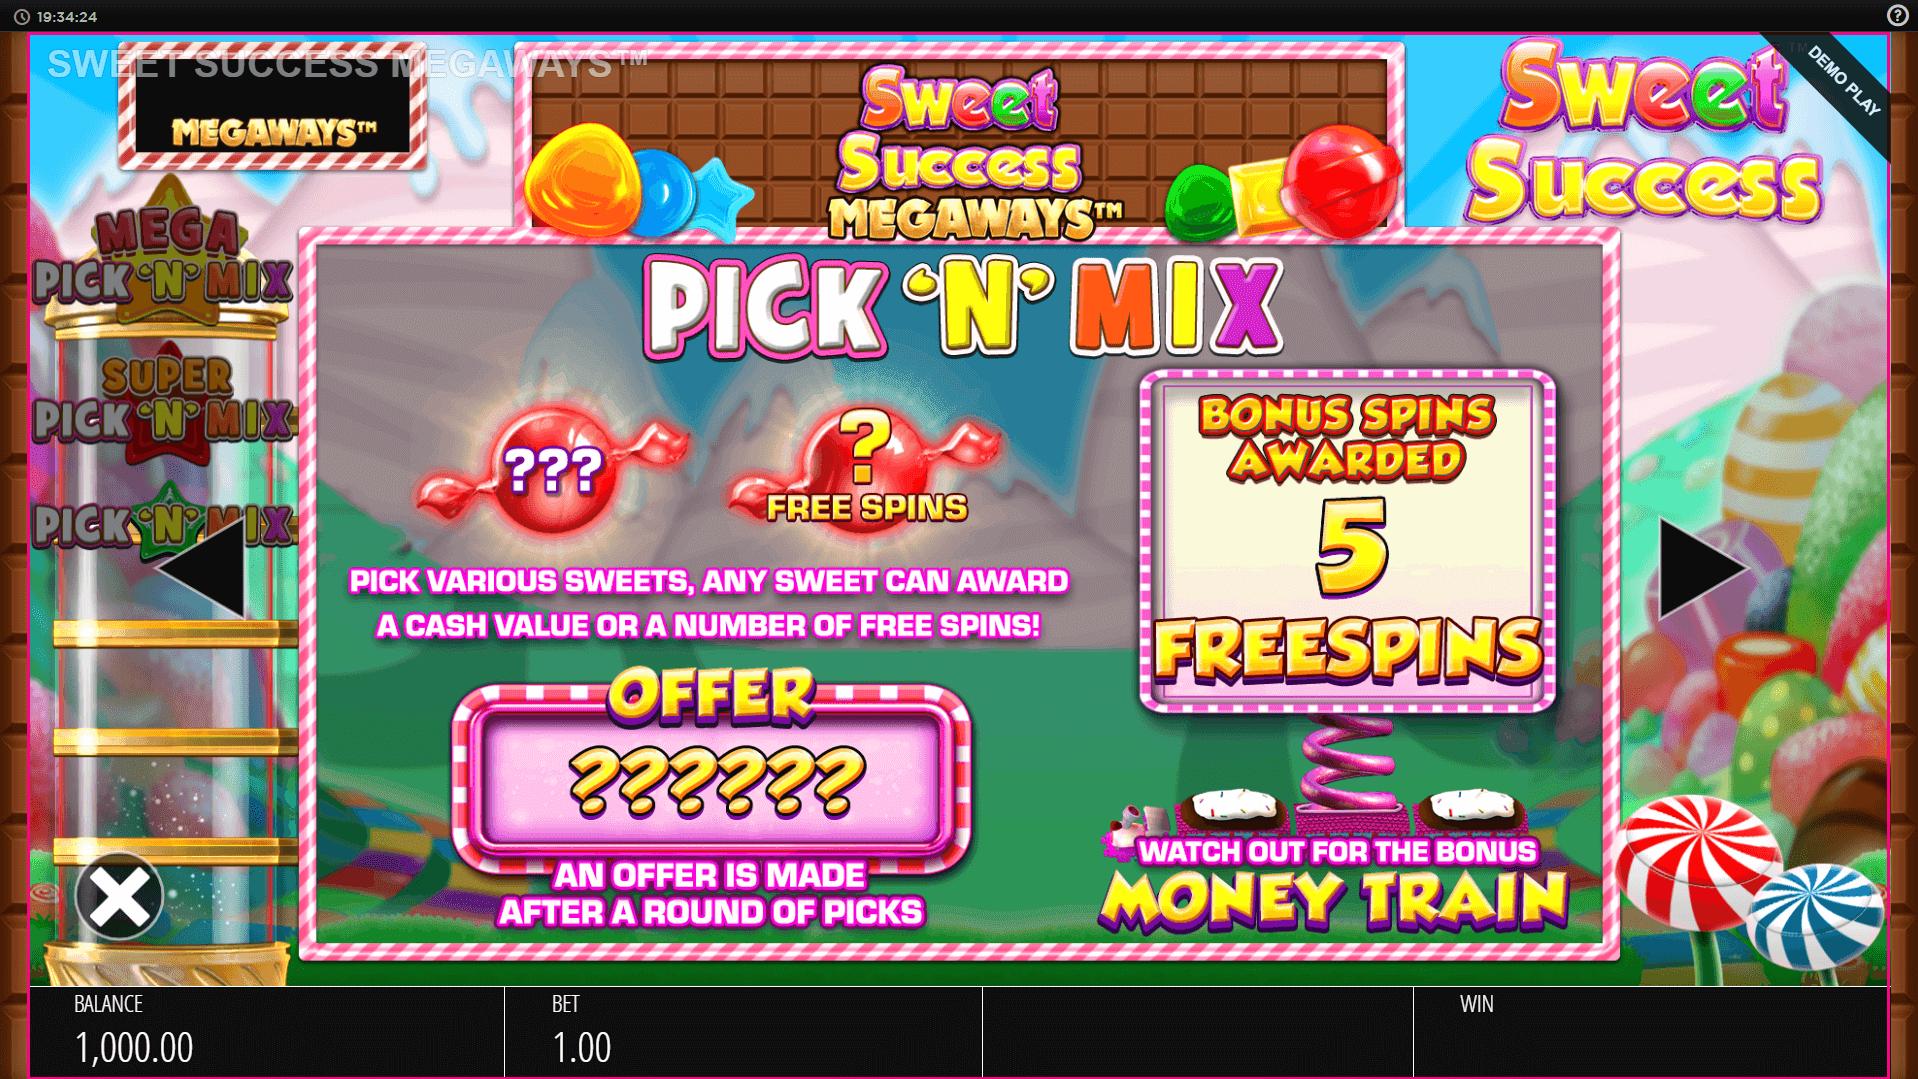 Sweet Success Slot Machine